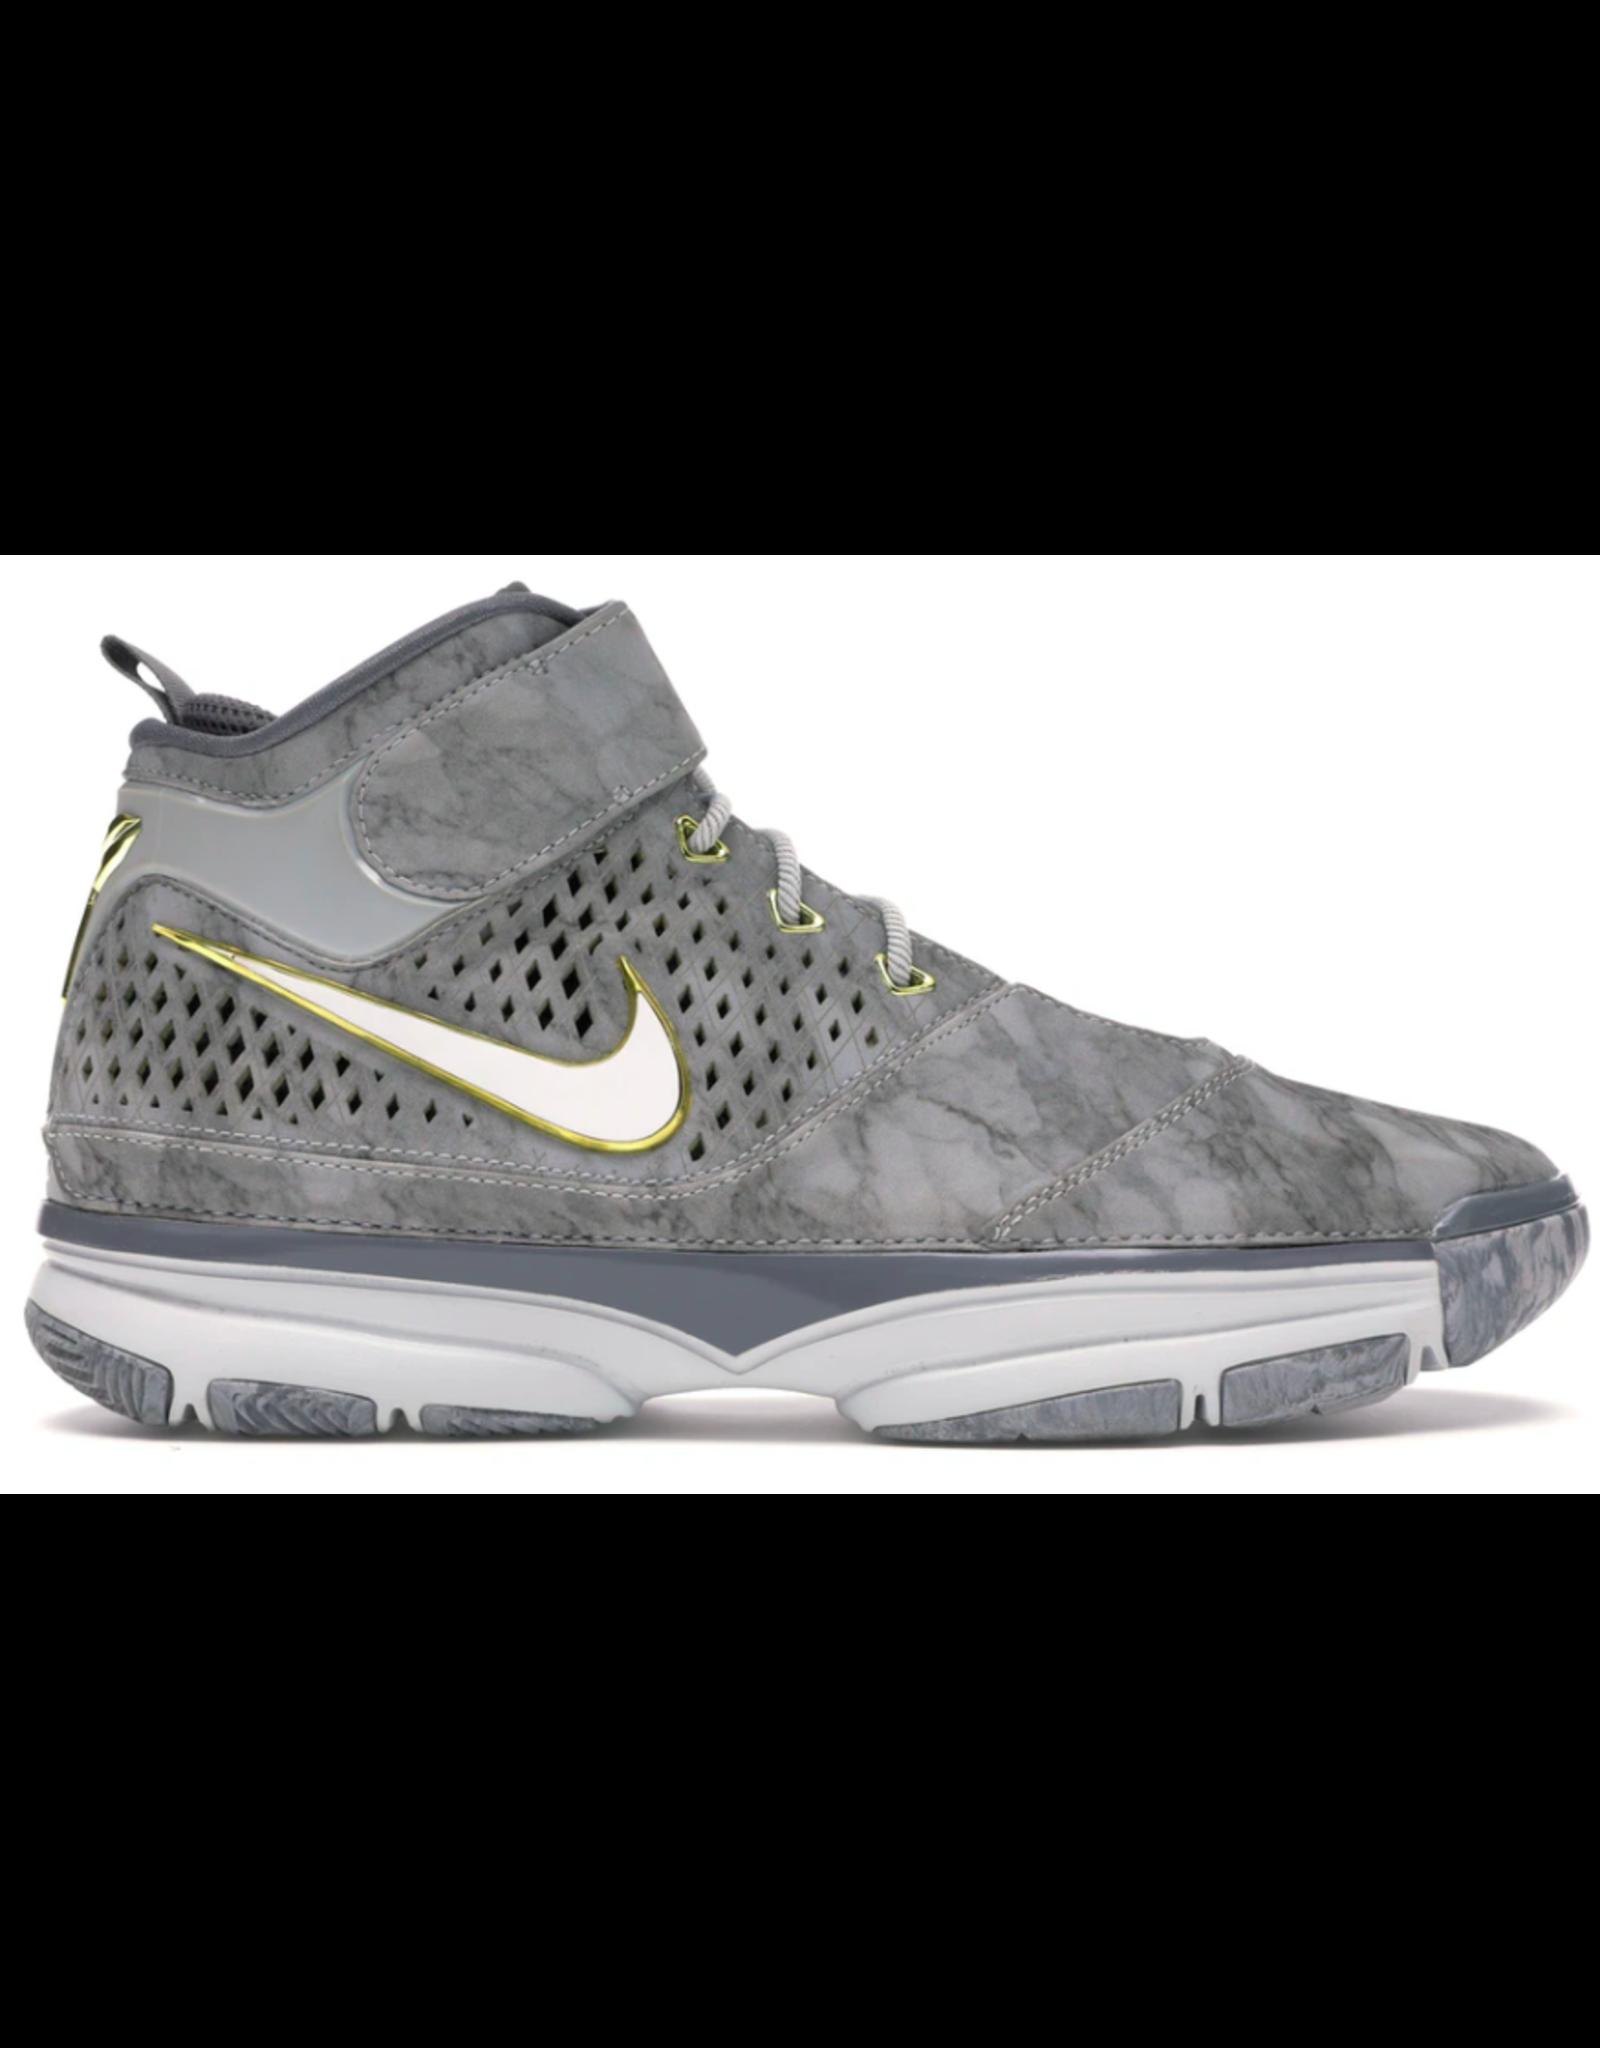 NIKE Nike Kobe 2 Prelude (4/50+ Points)